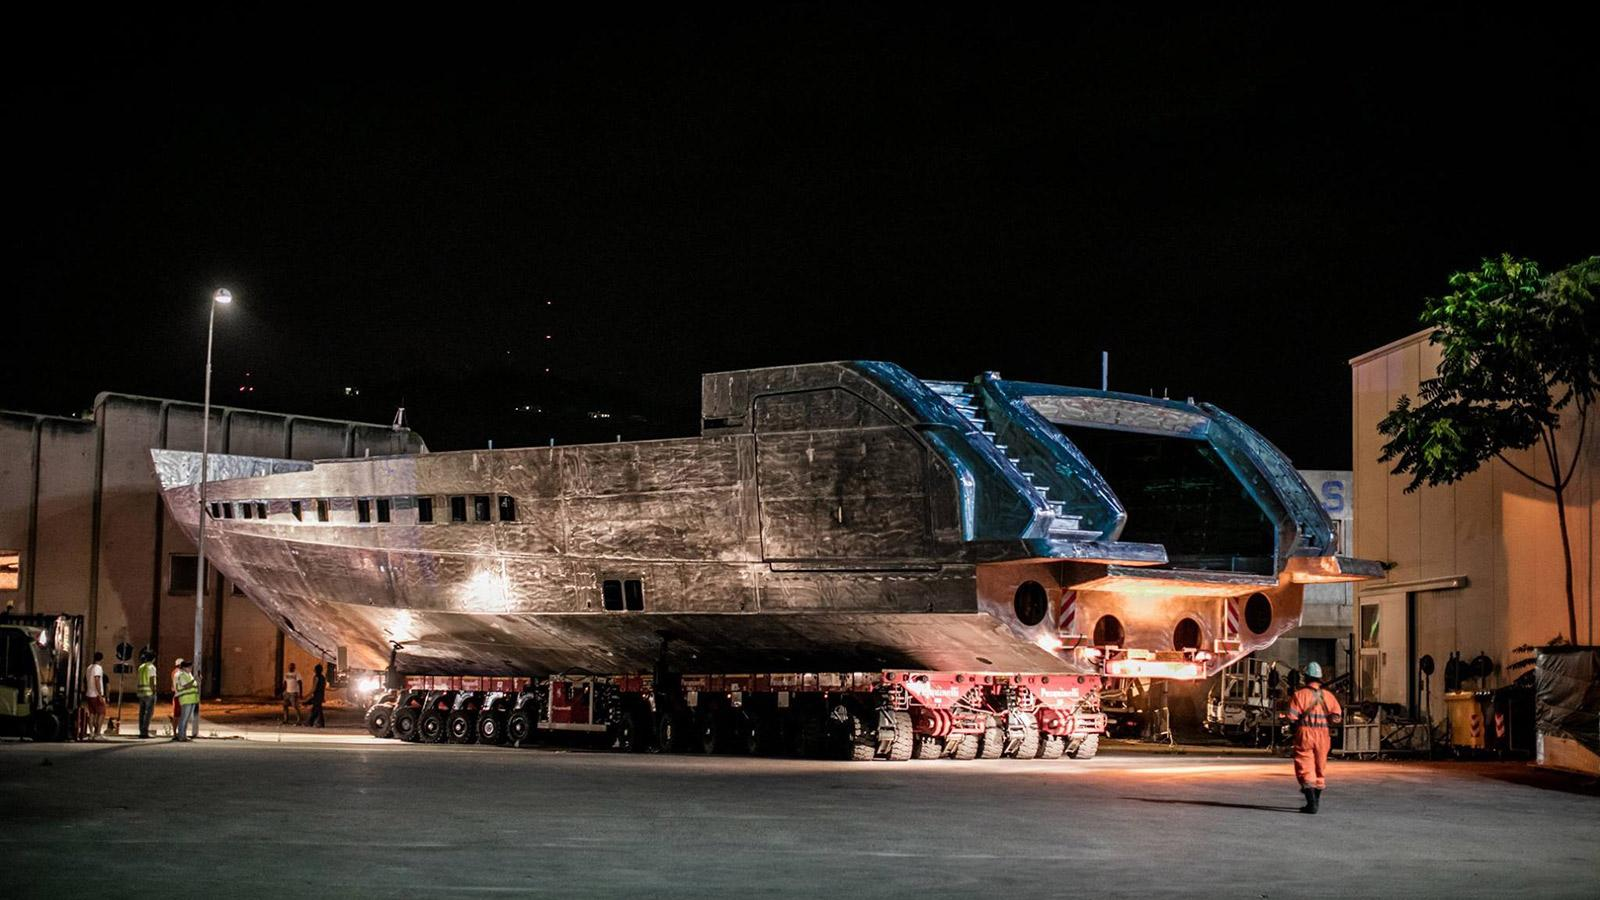 pershing 140 motoryacht pershing yachts 43m 2018 under construction hull half stern